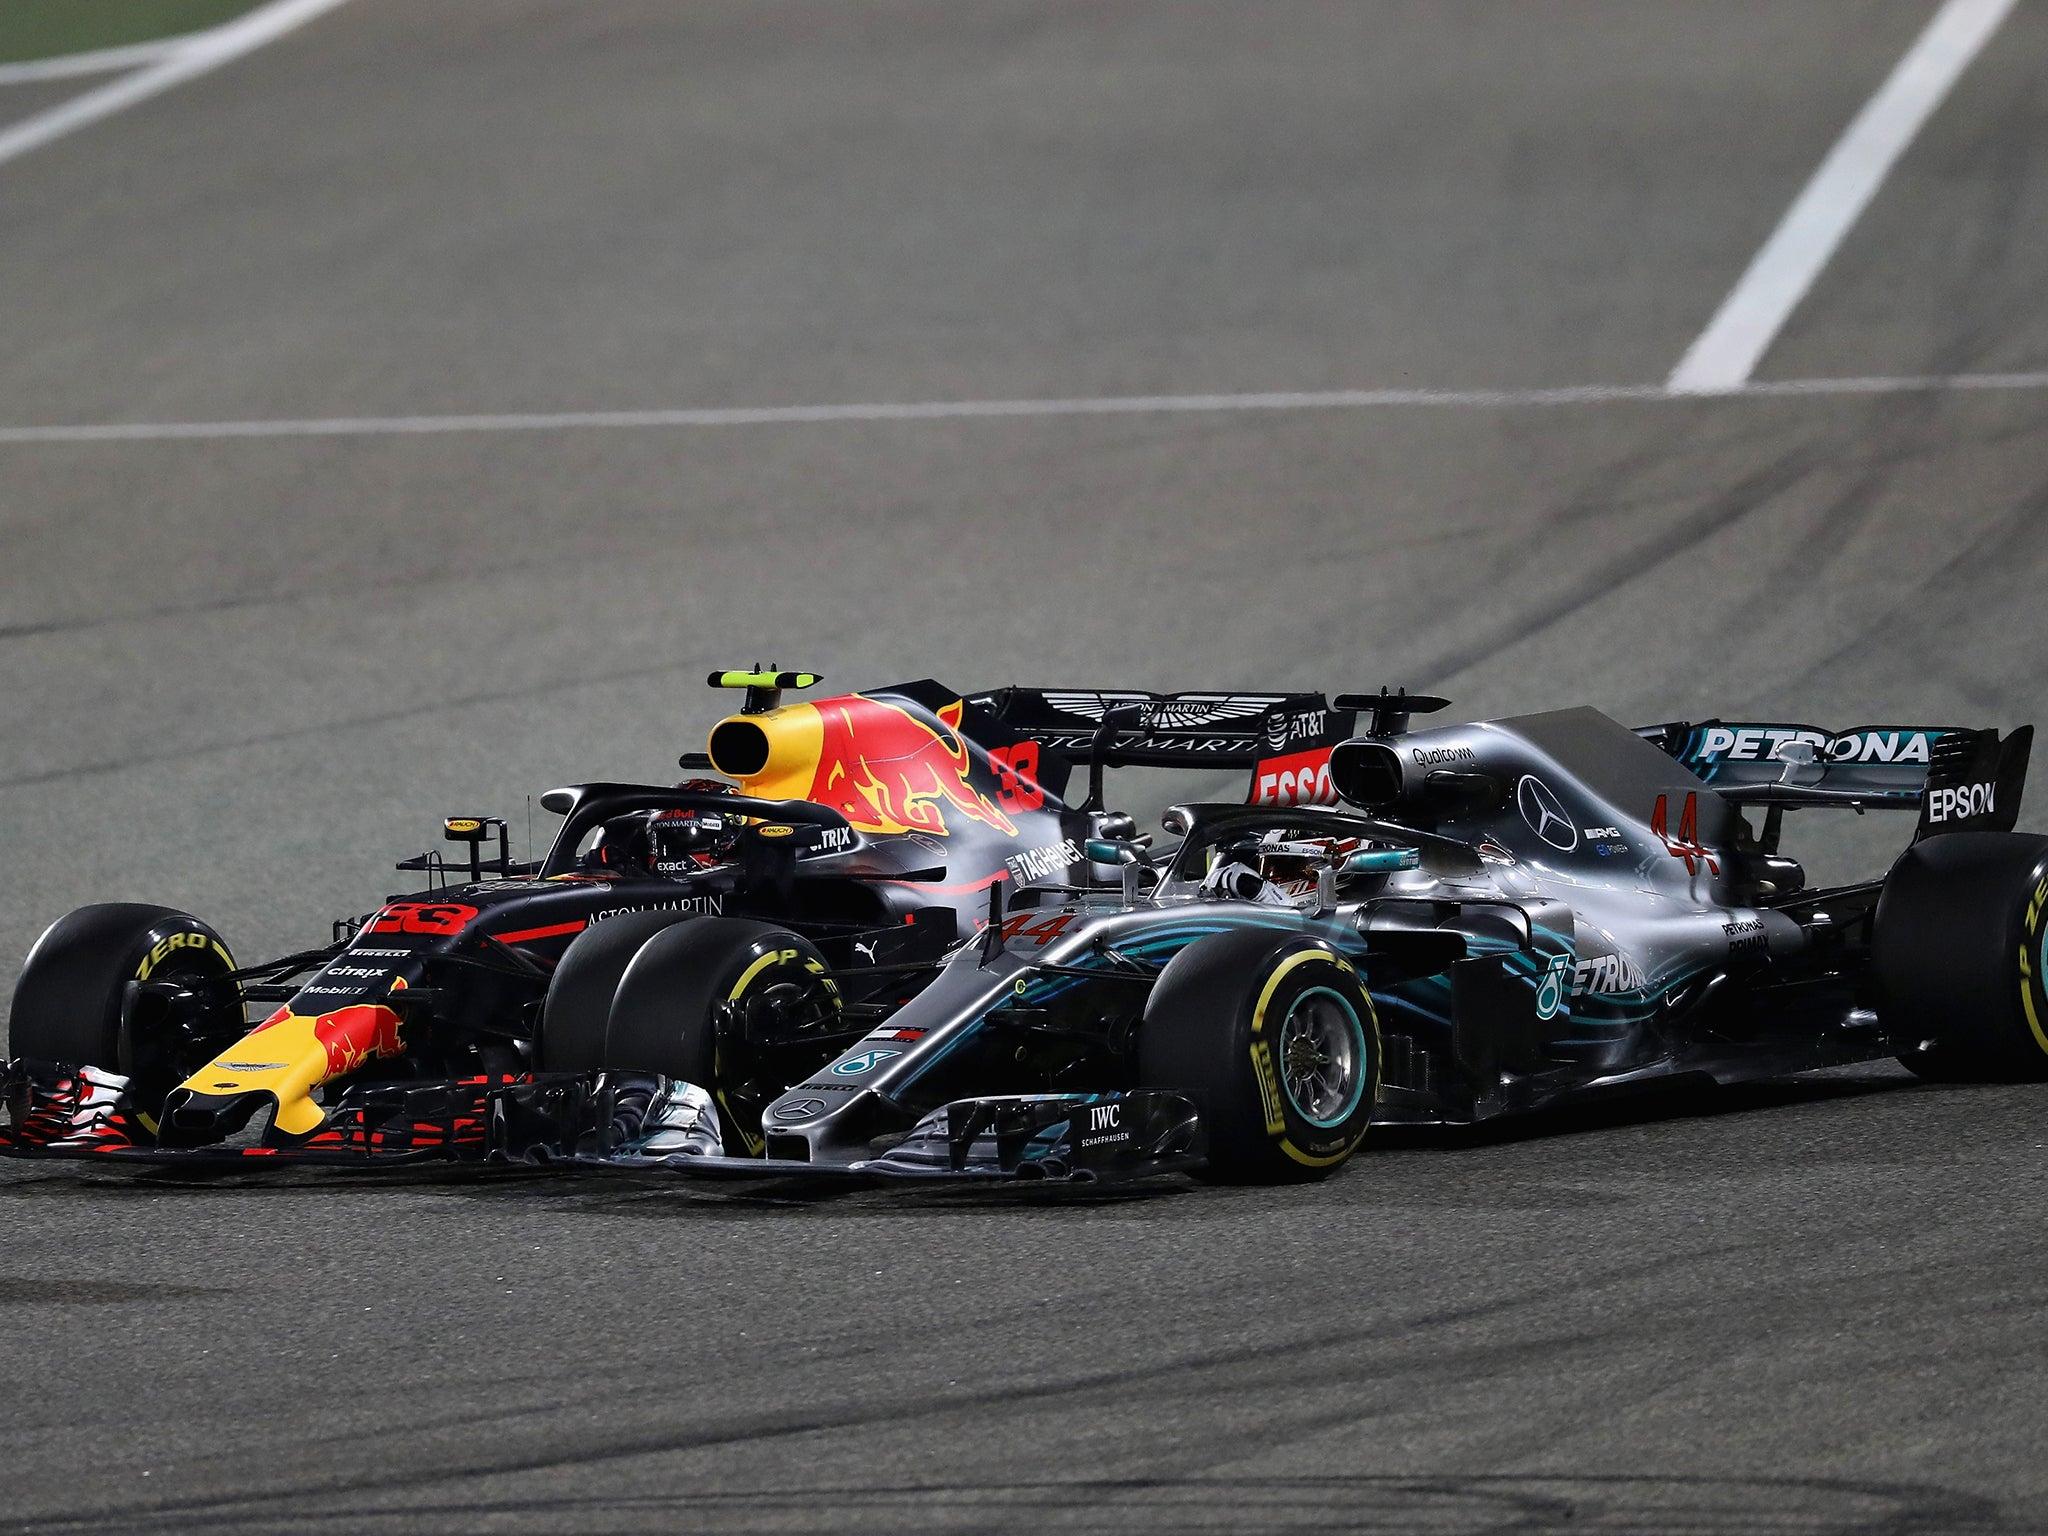 Max Verstappen accuses Formula One world champion Lewis Hamilton of